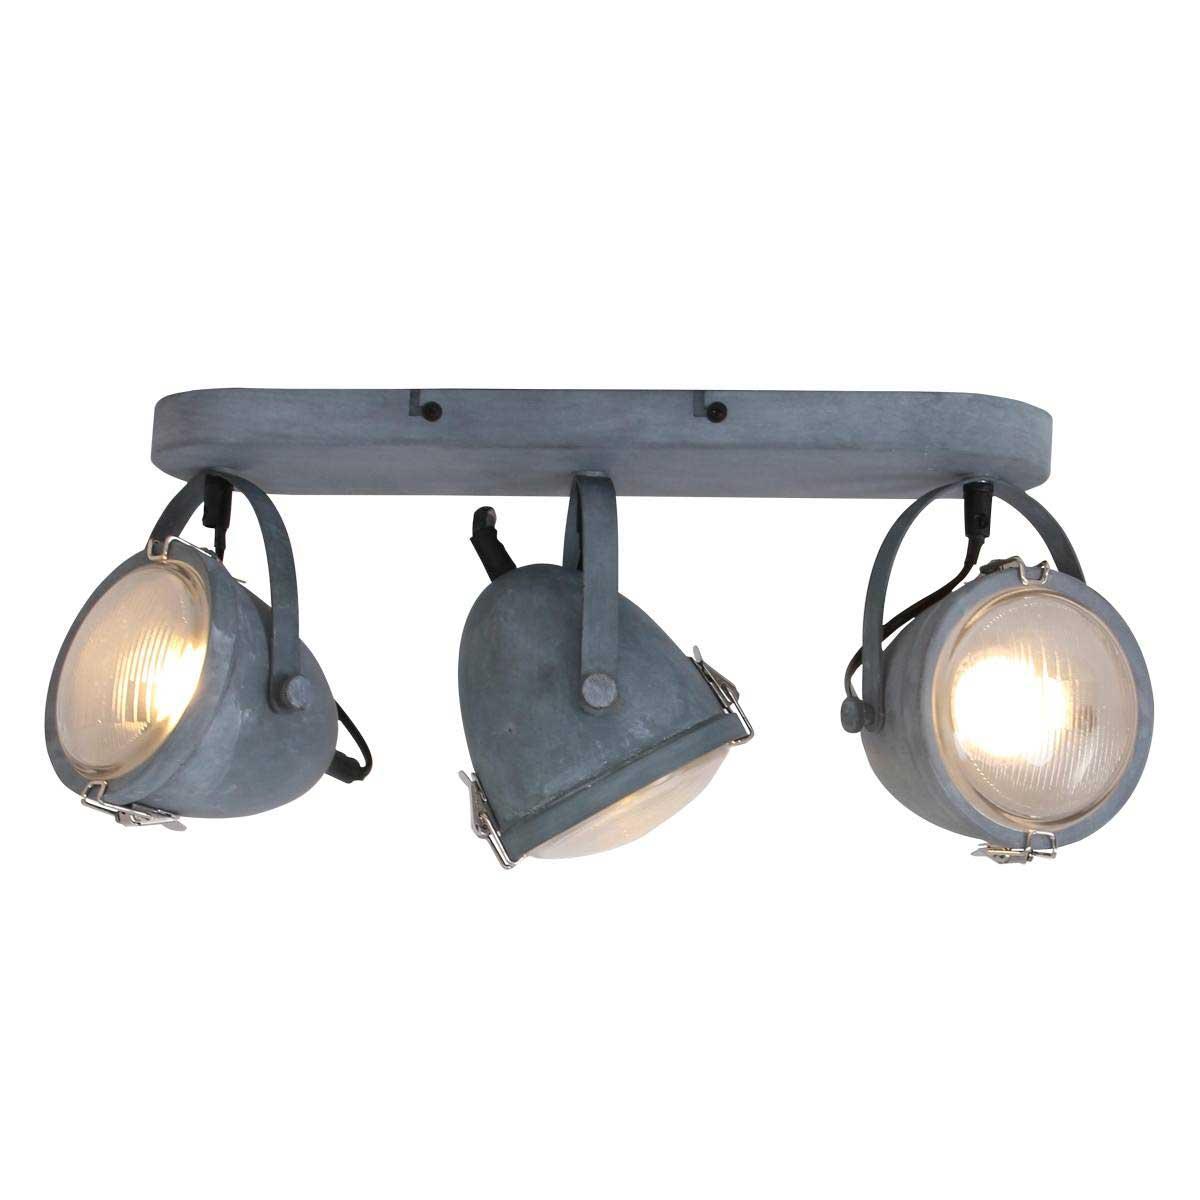 Industriële plafondlamp 3-lichts spot MEXLITE - 1314GR - industrie lamp - industriele plafondlamp - landelijk - industrieel - Mexlite